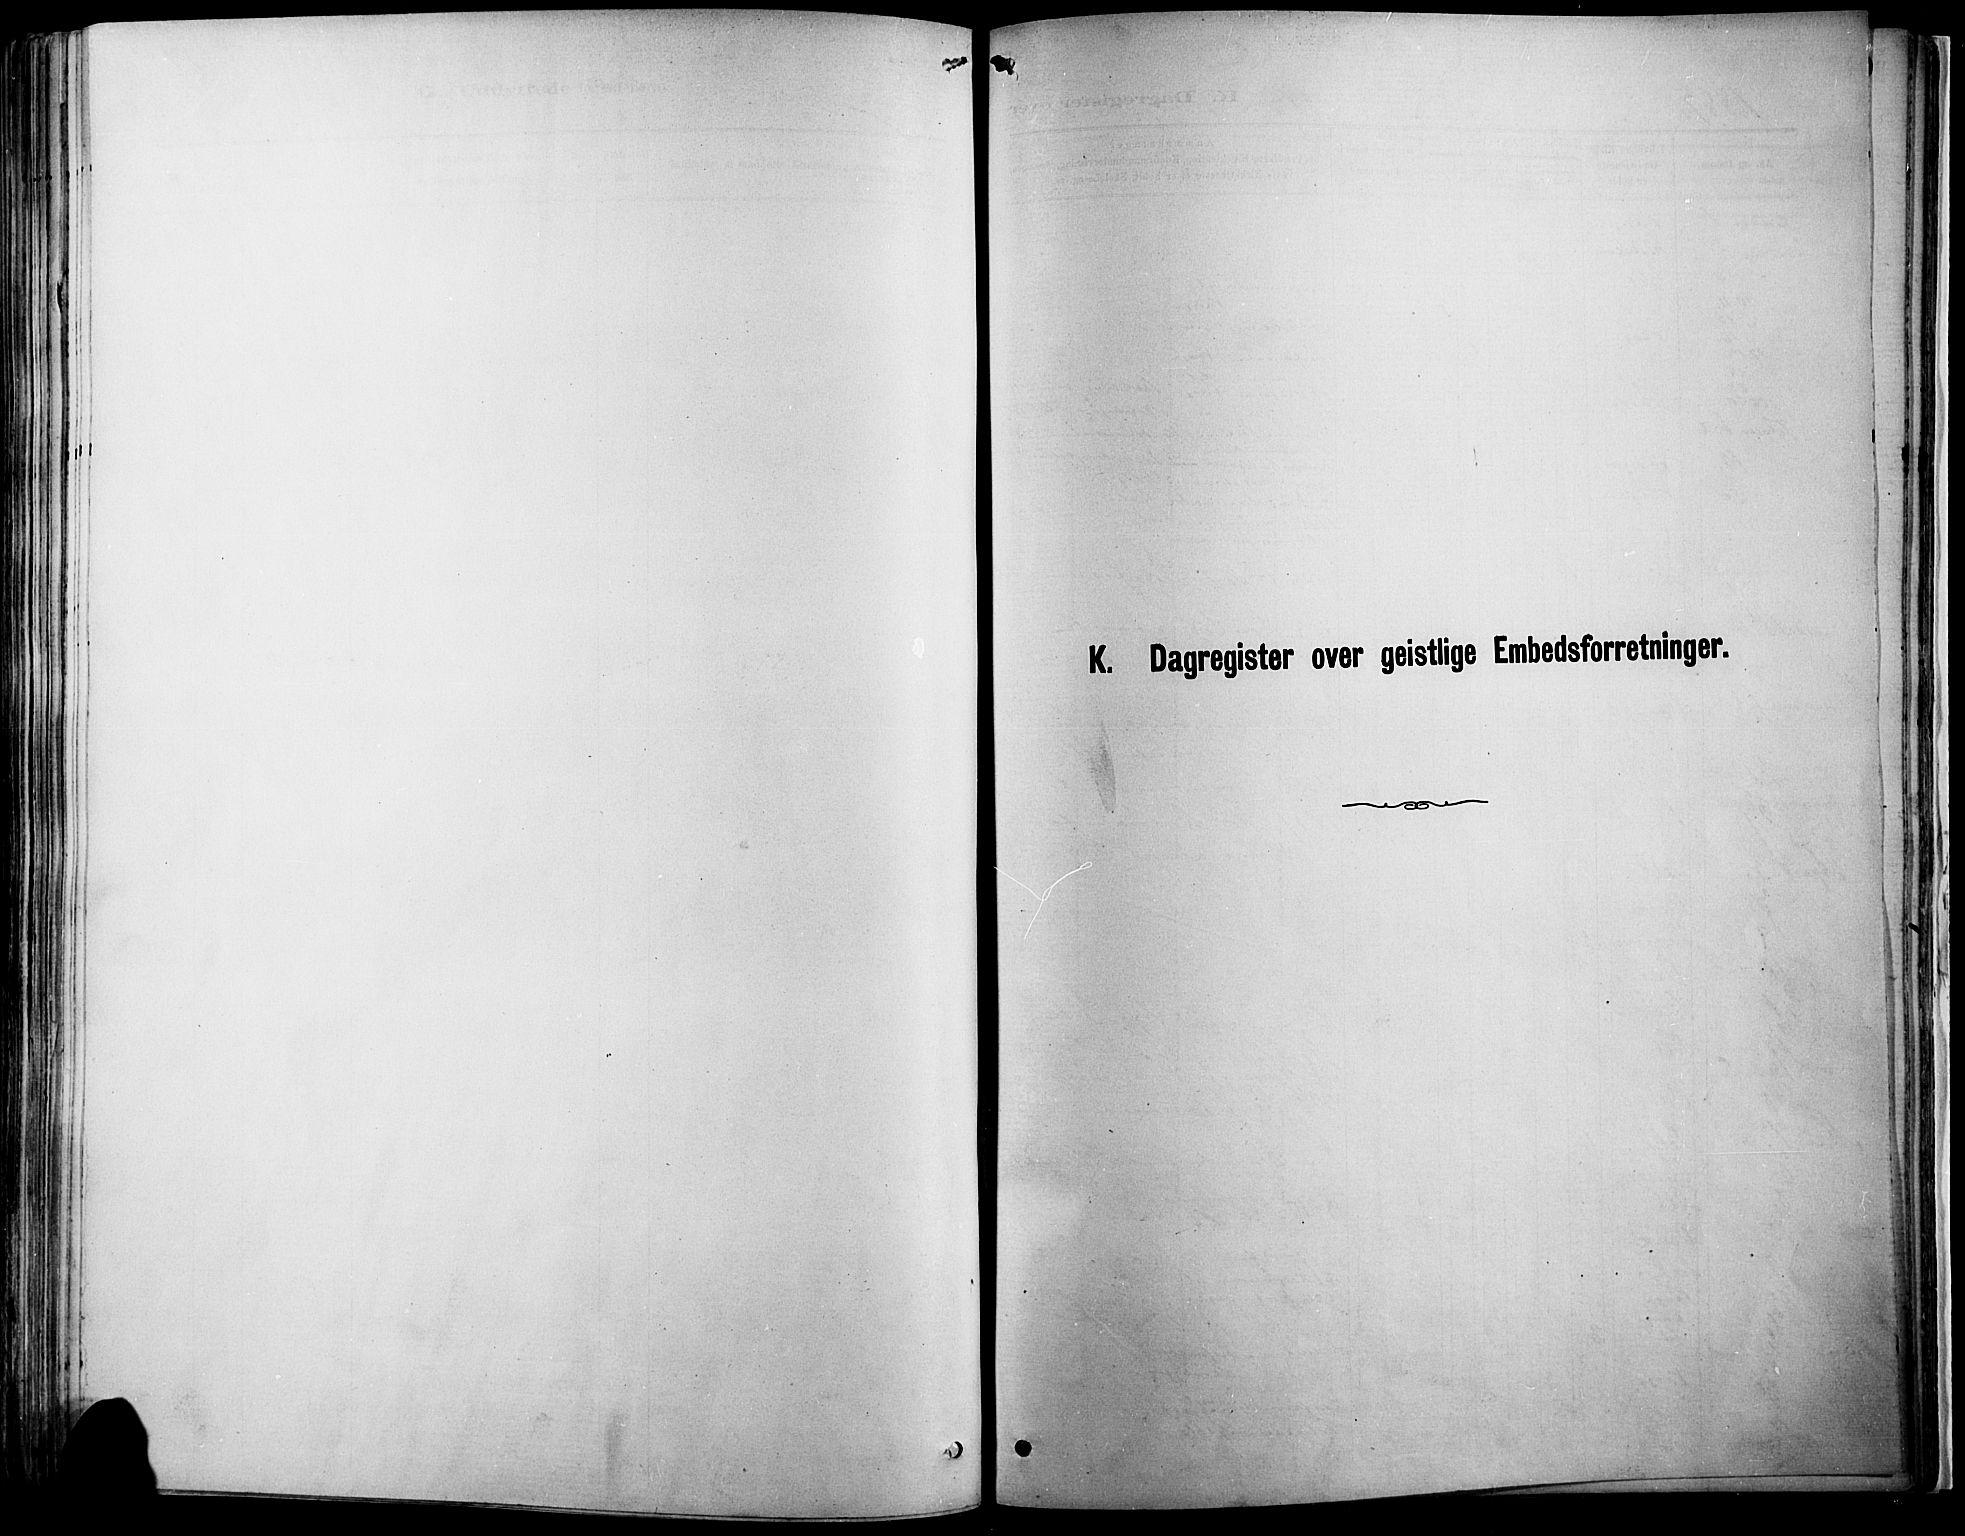 SAH, Vågå prestekontor, Ministerialbok nr. 9, 1886-1904